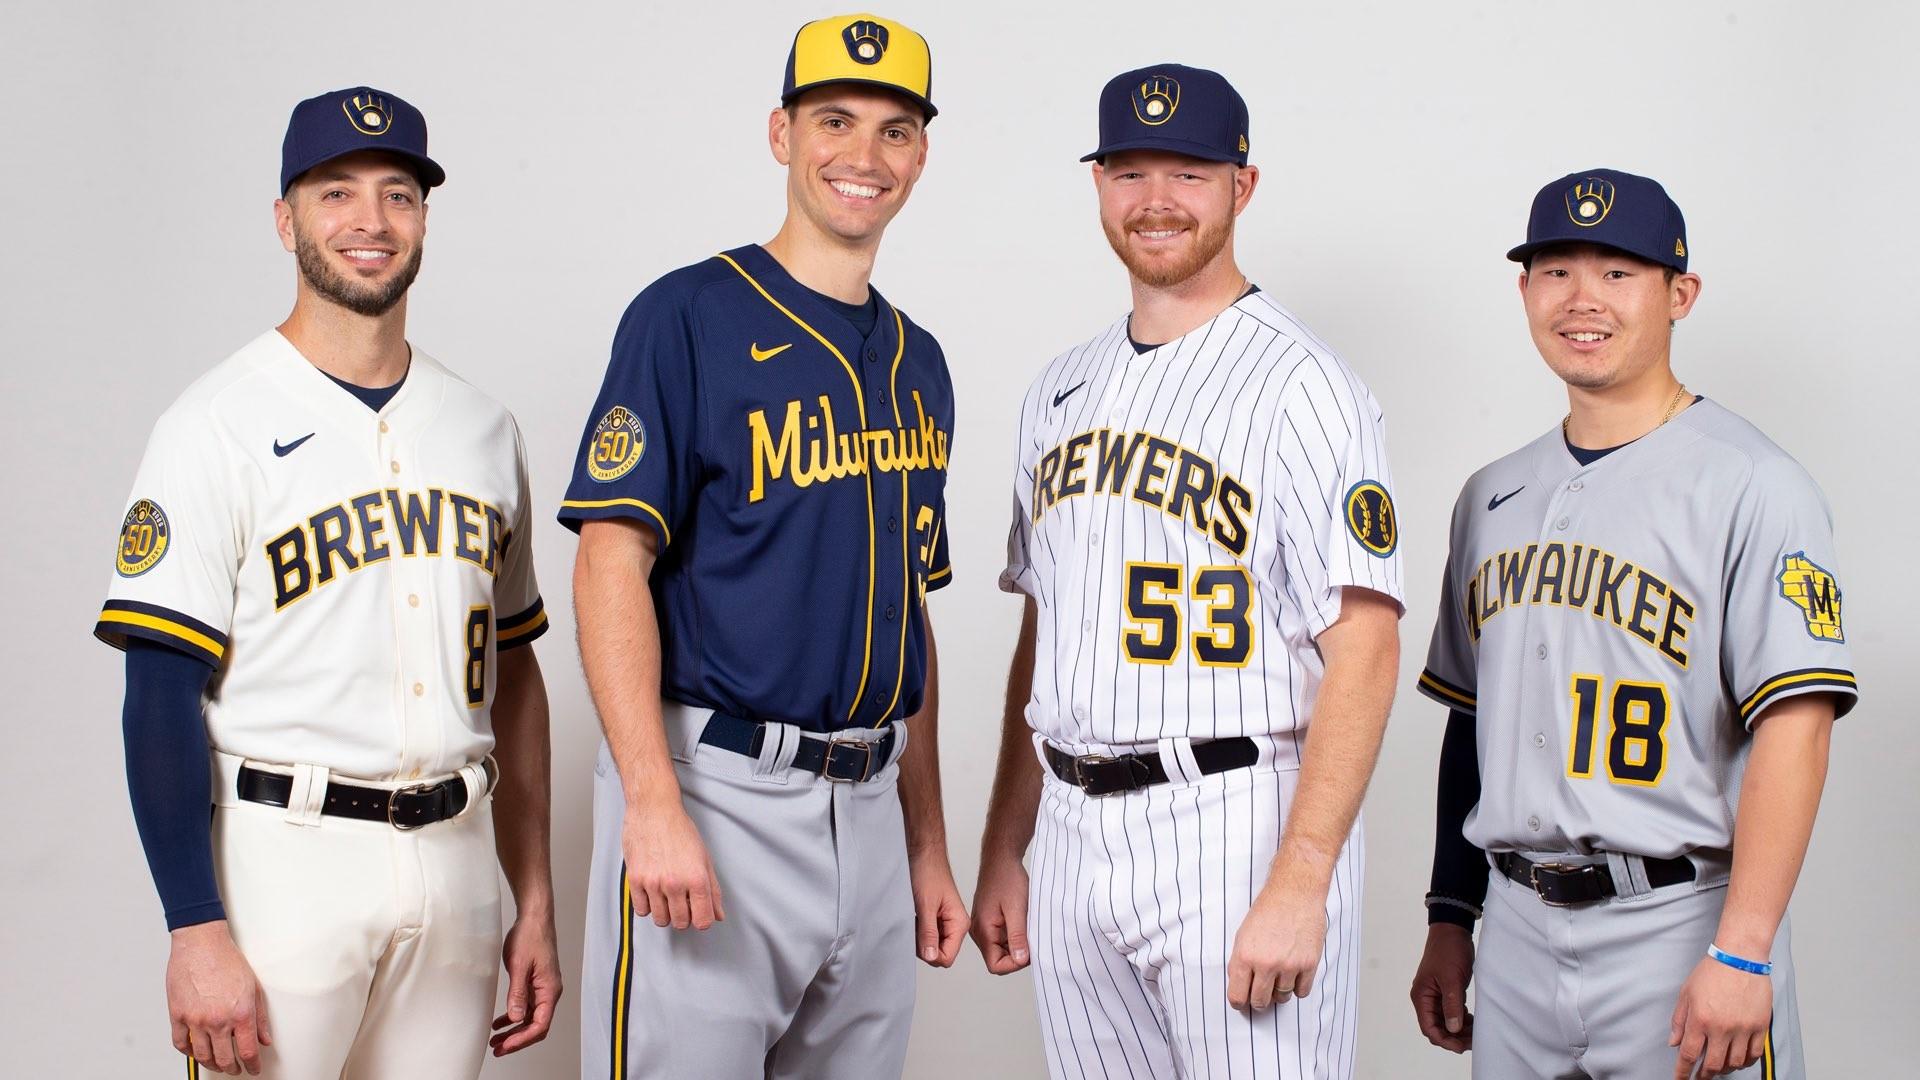 best baseball jerseys